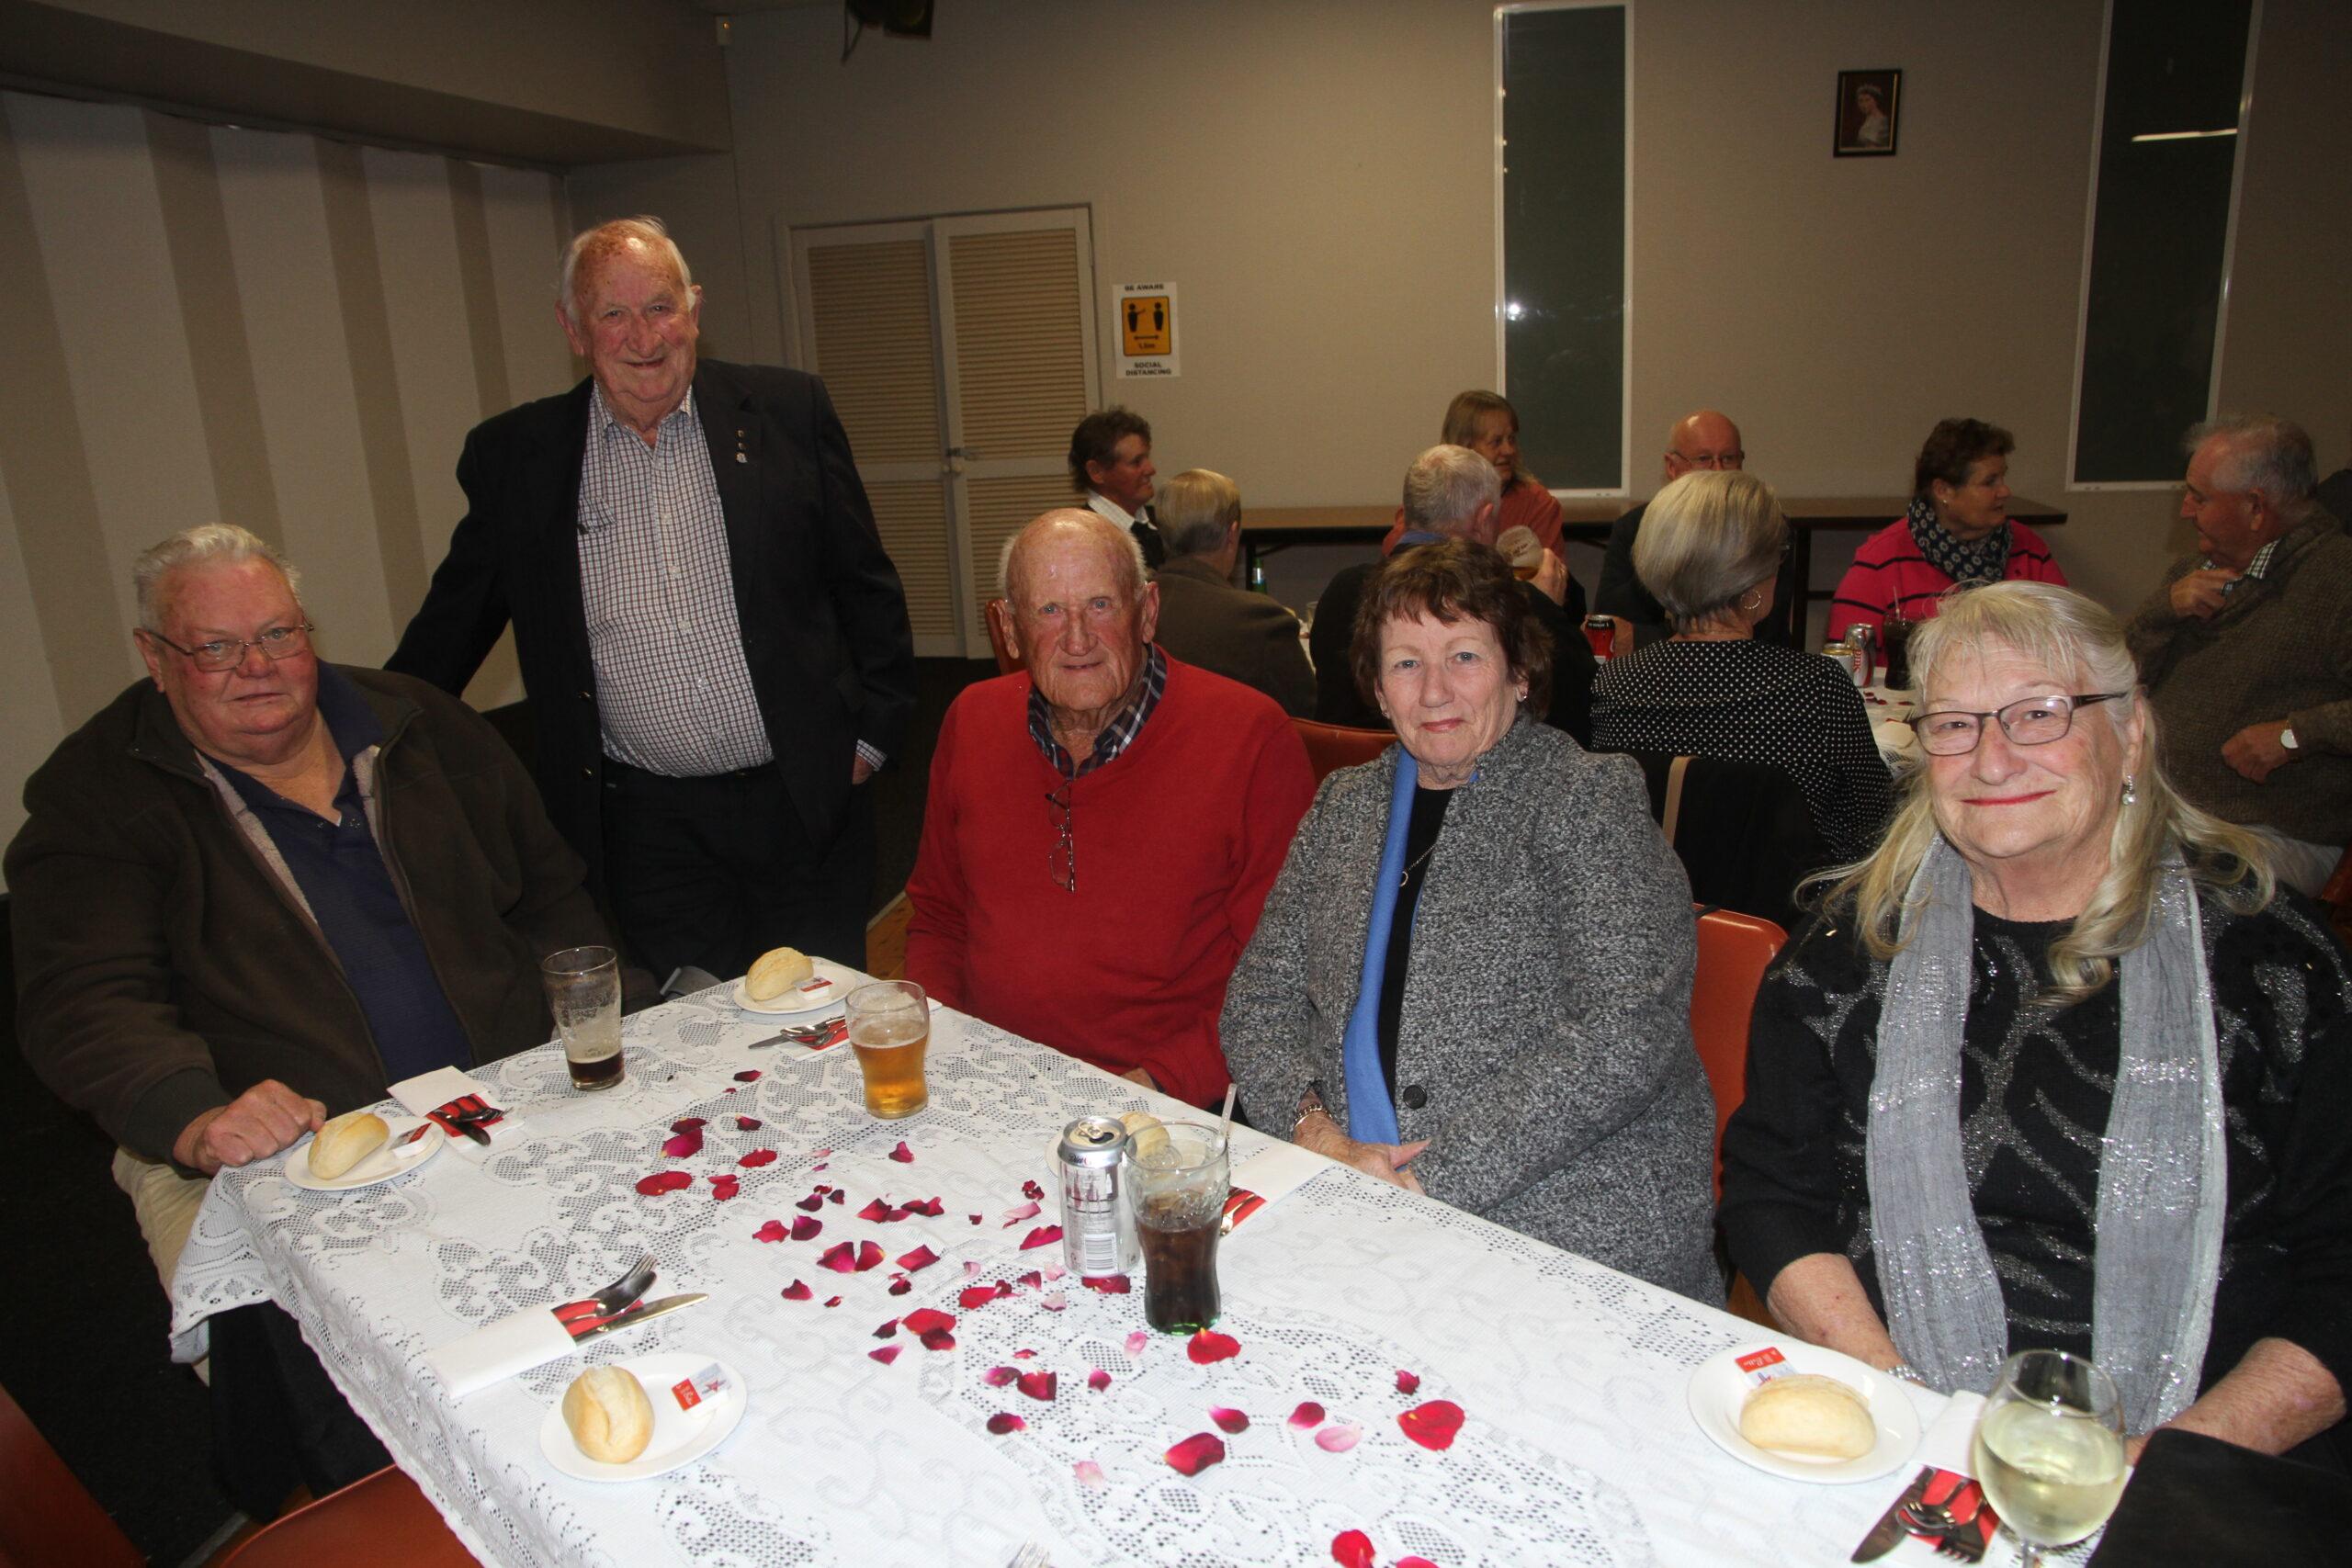 Don Madden, Gordon Cain, Robert and Margaret Stoltenberg and Helen Cain.